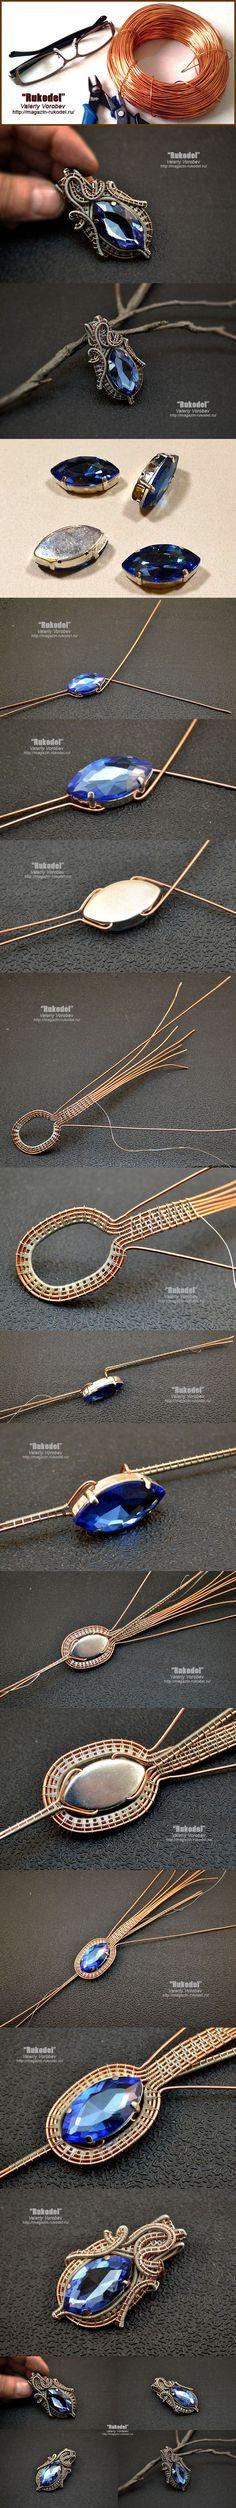 Wire wrap Pendant on Vorobev. Wire wrap tutorial. Go to the blog Rukodel - http://magazin-rukodel.ru/         #Rukodel, #Vorobev, #handmade, #wirewrap, #wirejewelry, #wirewrapped, #Jewelry, #tutorial, #WireWrapping, #Рукодел, #VikingKnit,